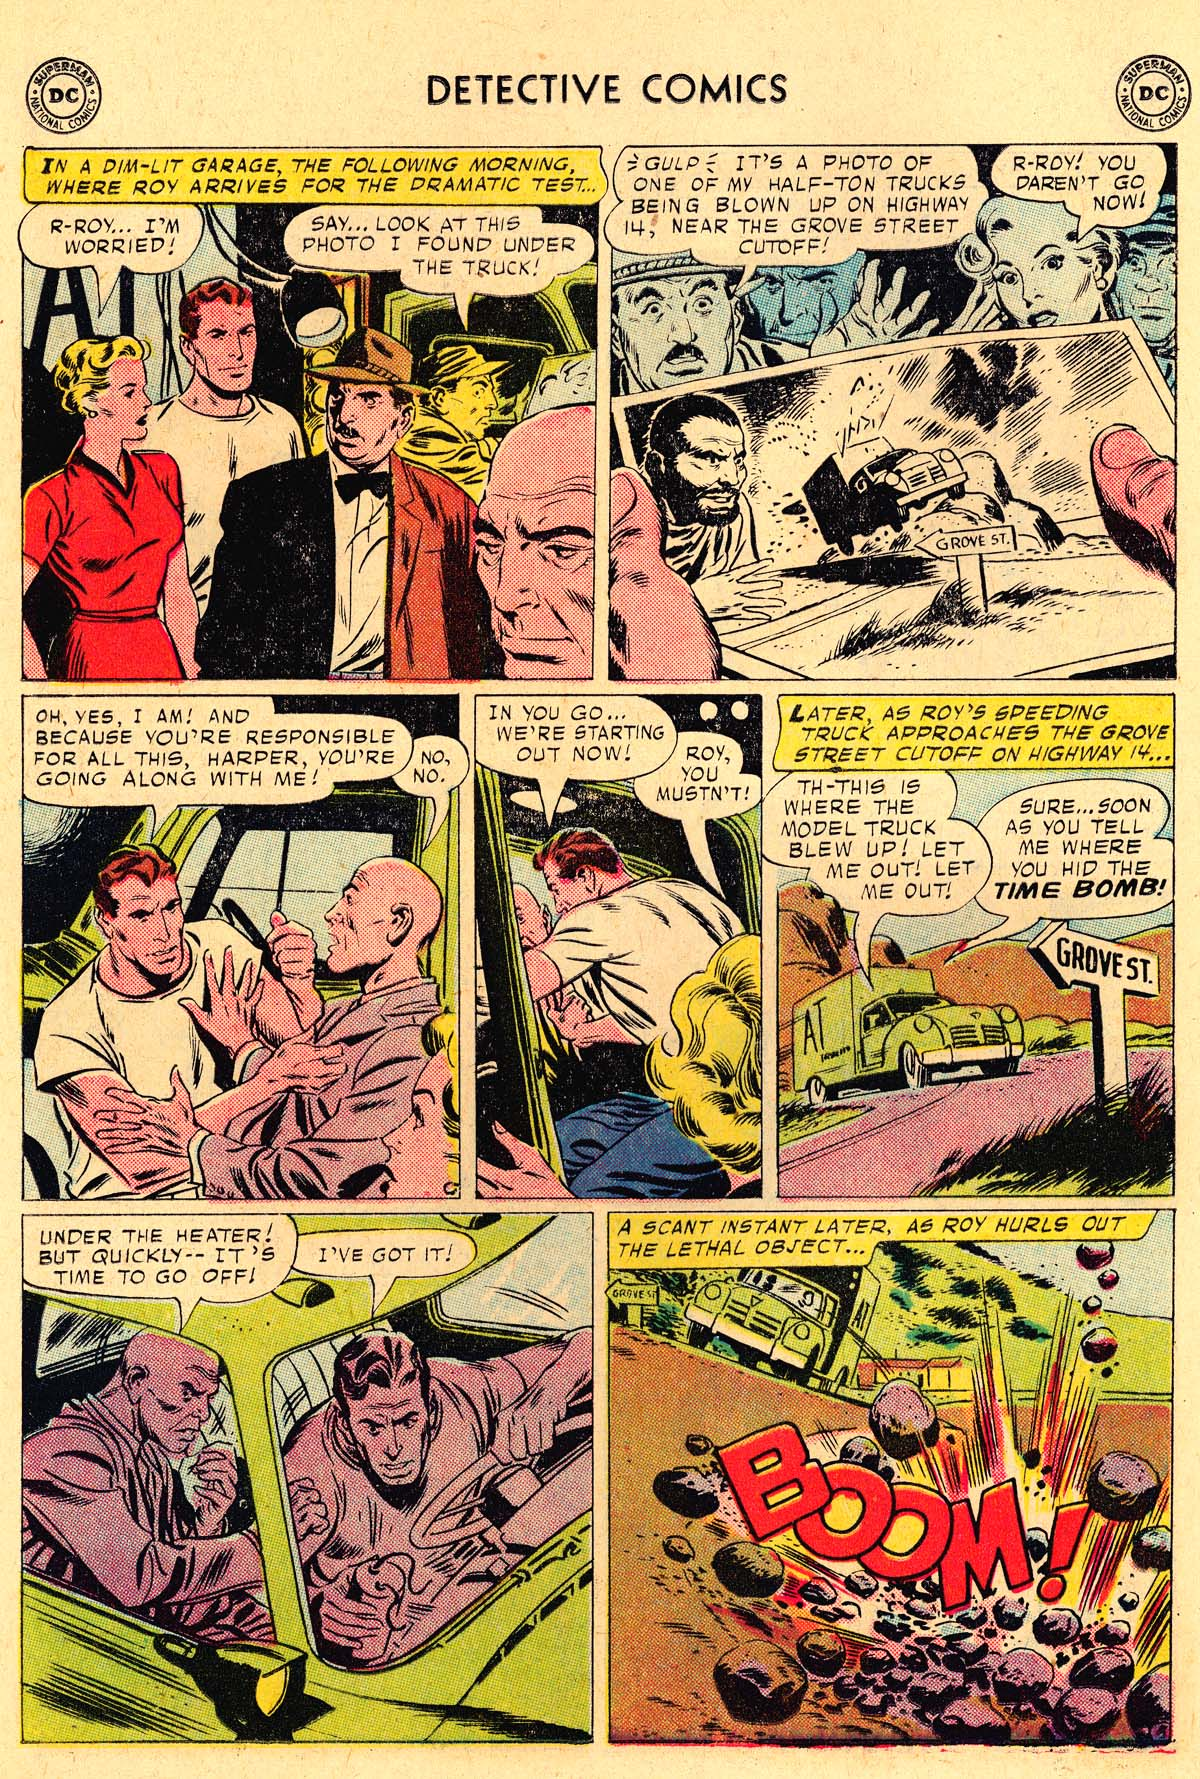 Detective Comics (1937) 259 Page 21